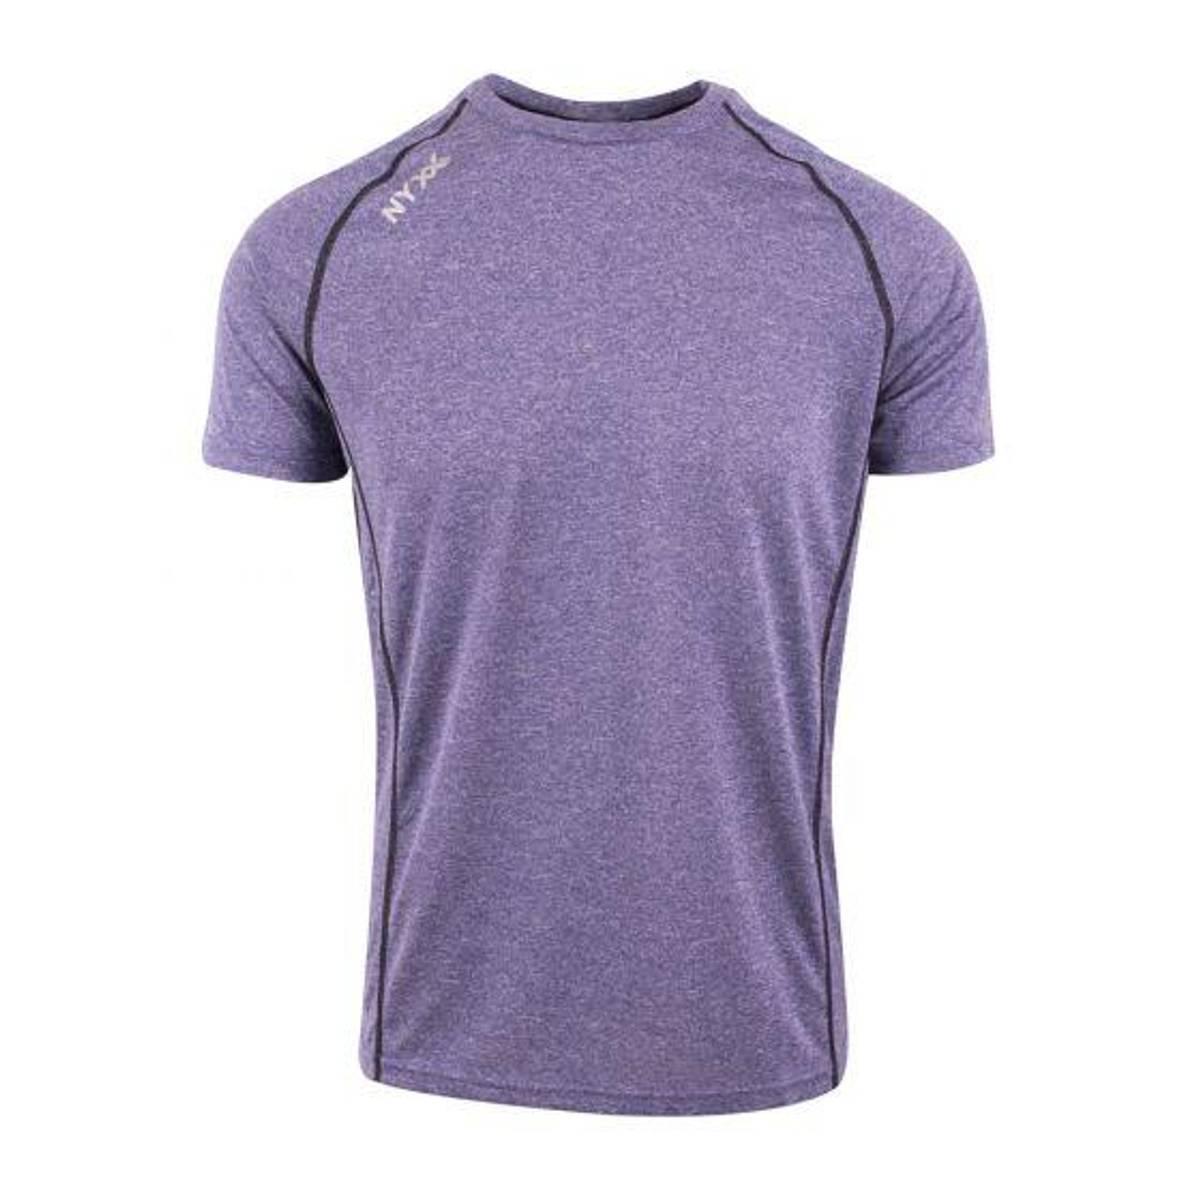 T-skjorte, X-treme, herre, lys lilla Str. M